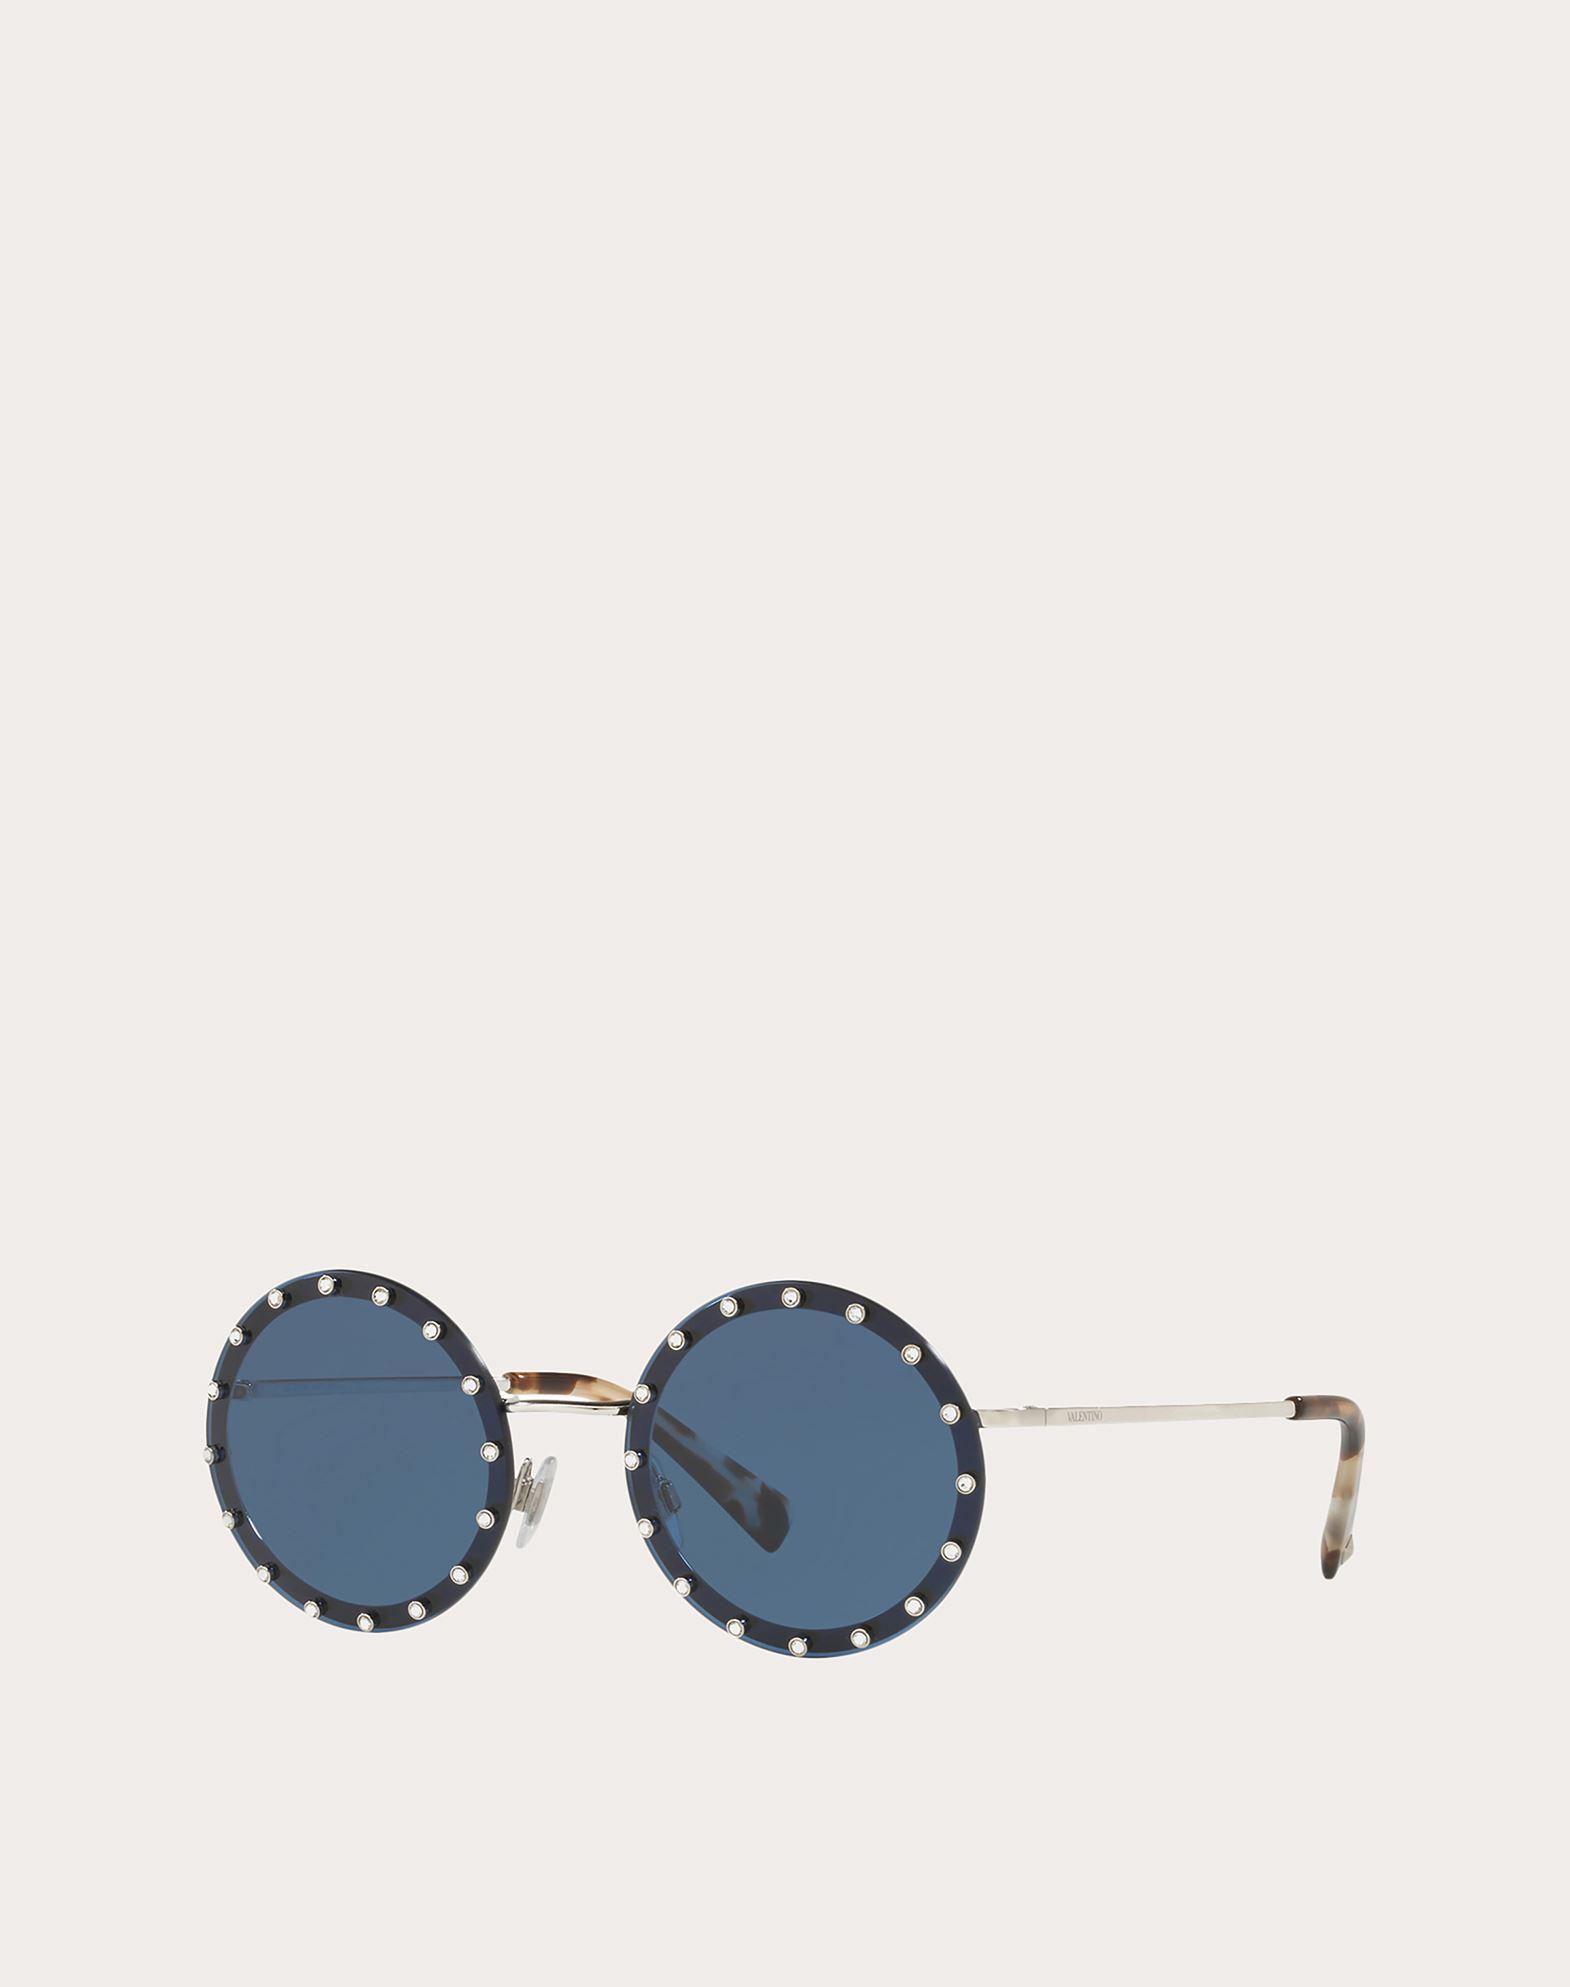 VALENTINO OCCHIALI Metal Sunglasses Sunglasses D r